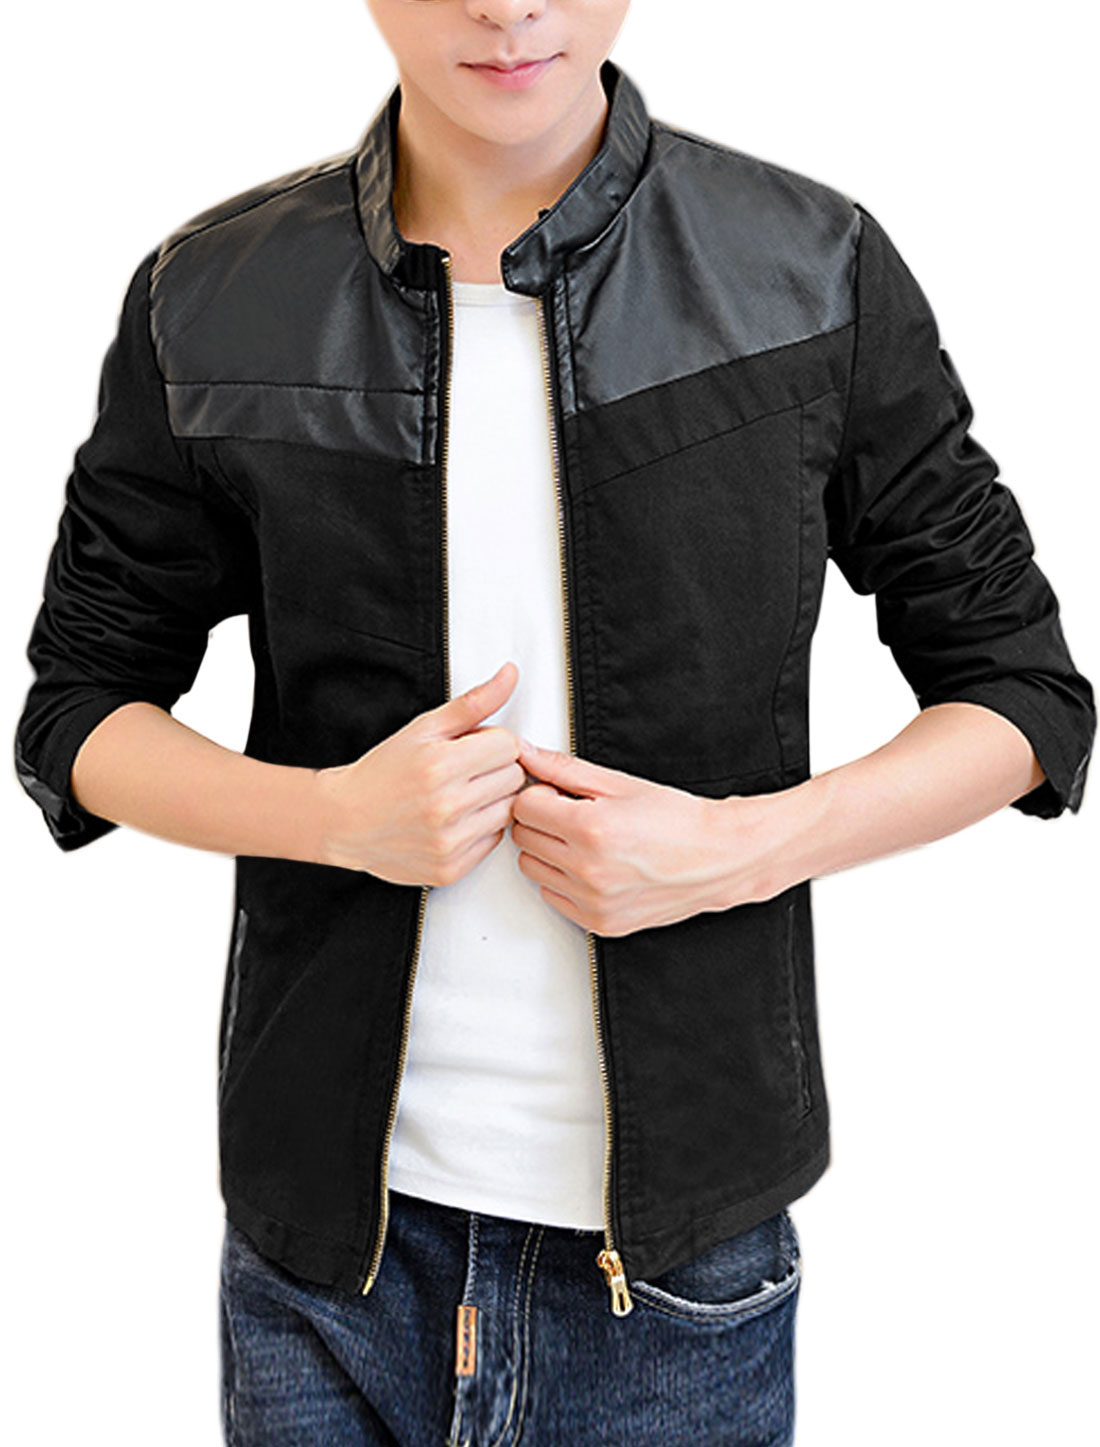 Men Imitation Leather Panel Stand Collar Zip Up Jacket Black M